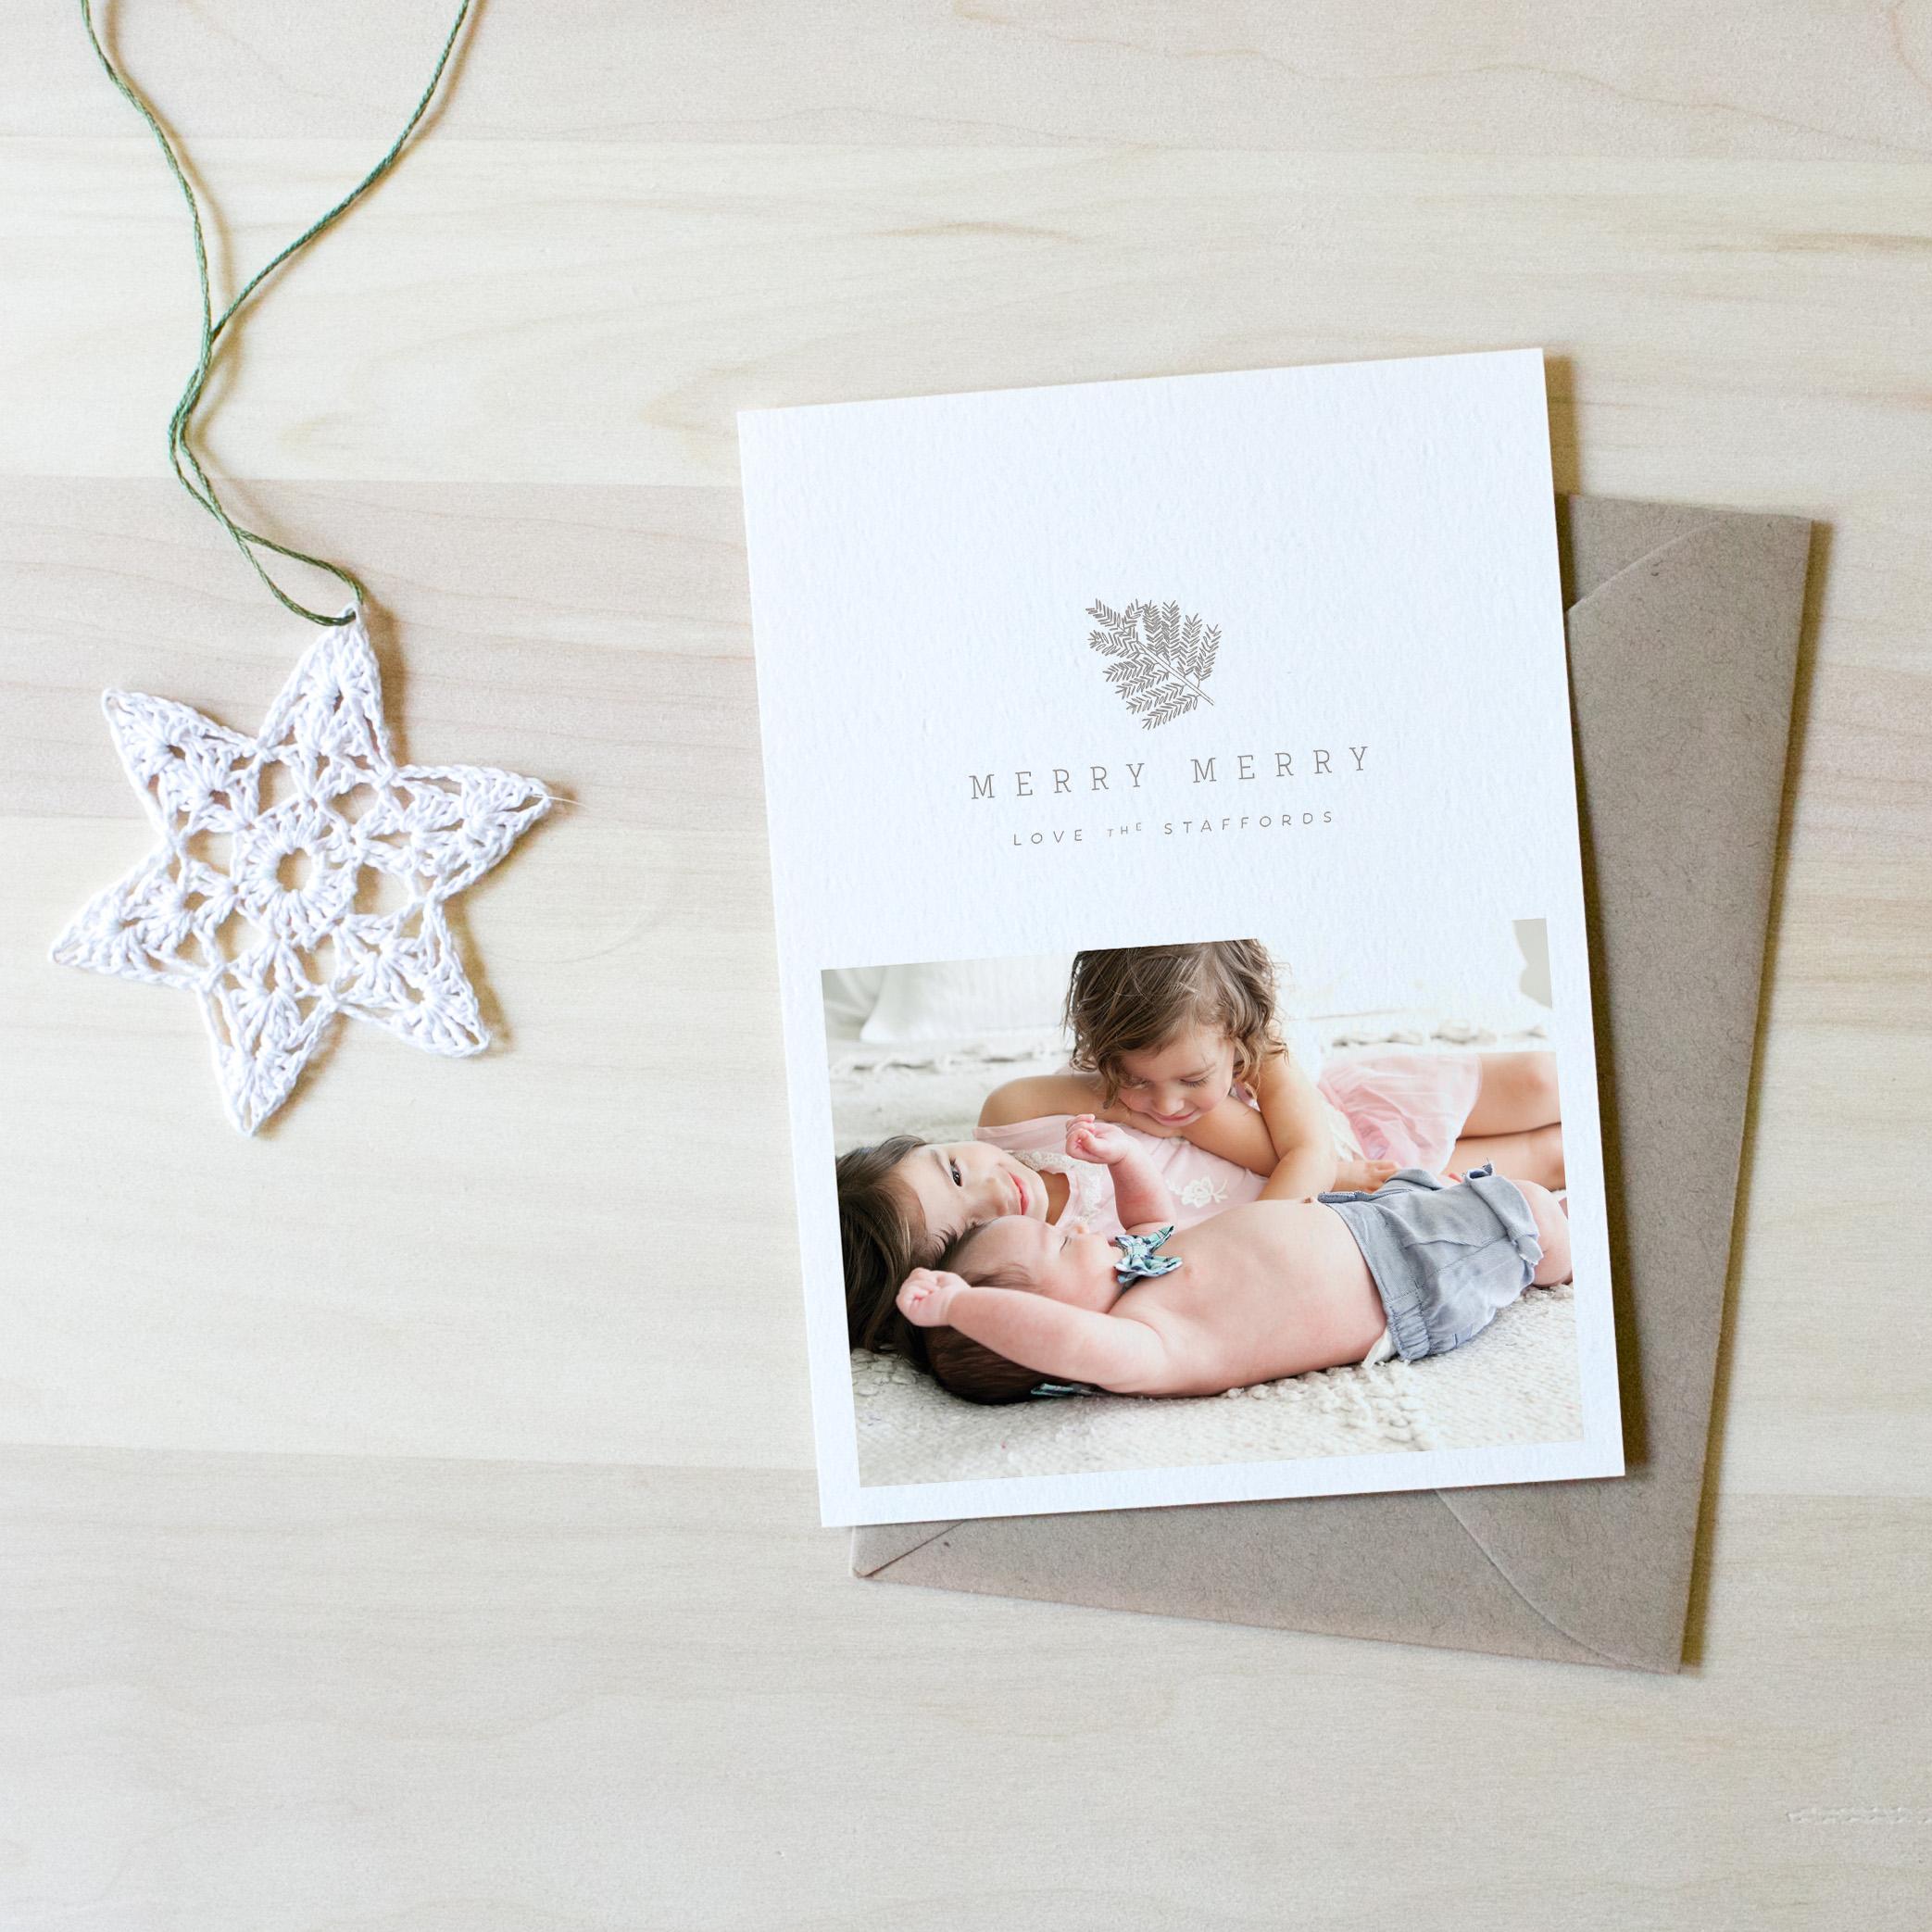 kate stafford photography | custom christmas card